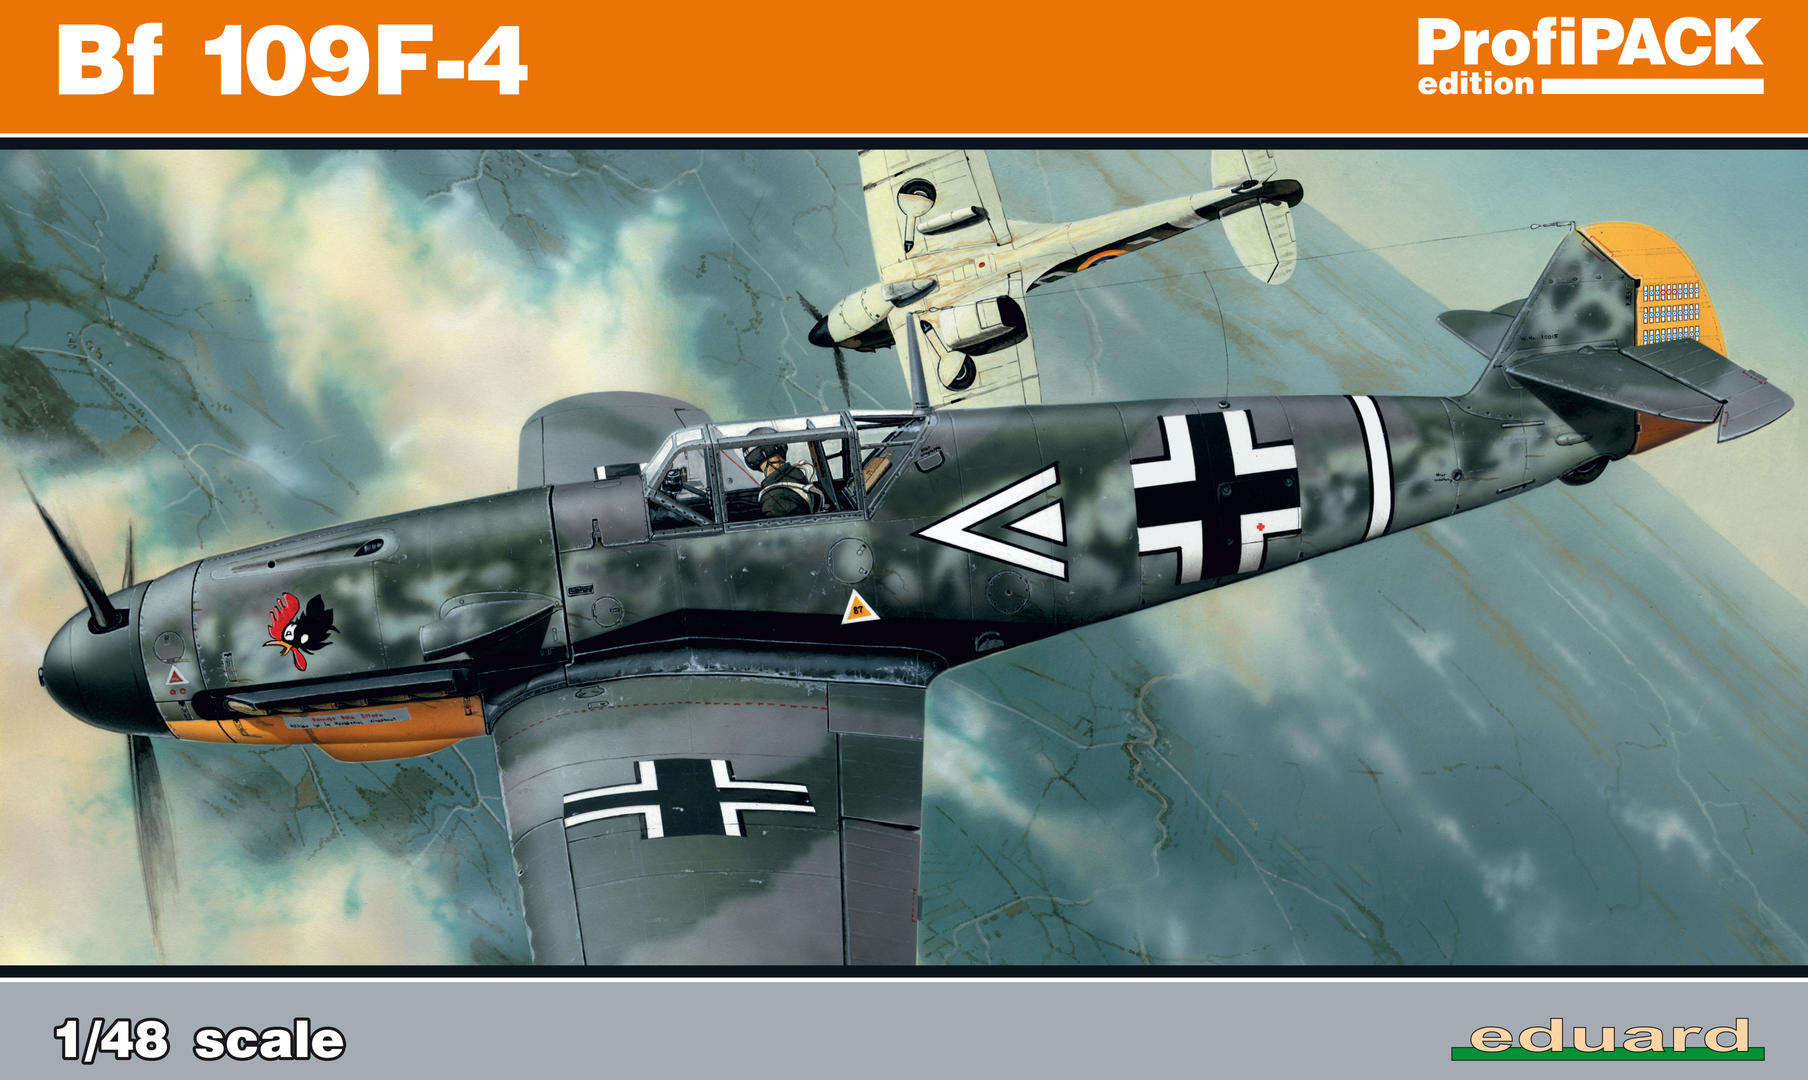 Eduard-82114-Bf-109-F-4-Profipack-Deckelbild Bf 109 F-4 ProfiPack von Eduard # 82114